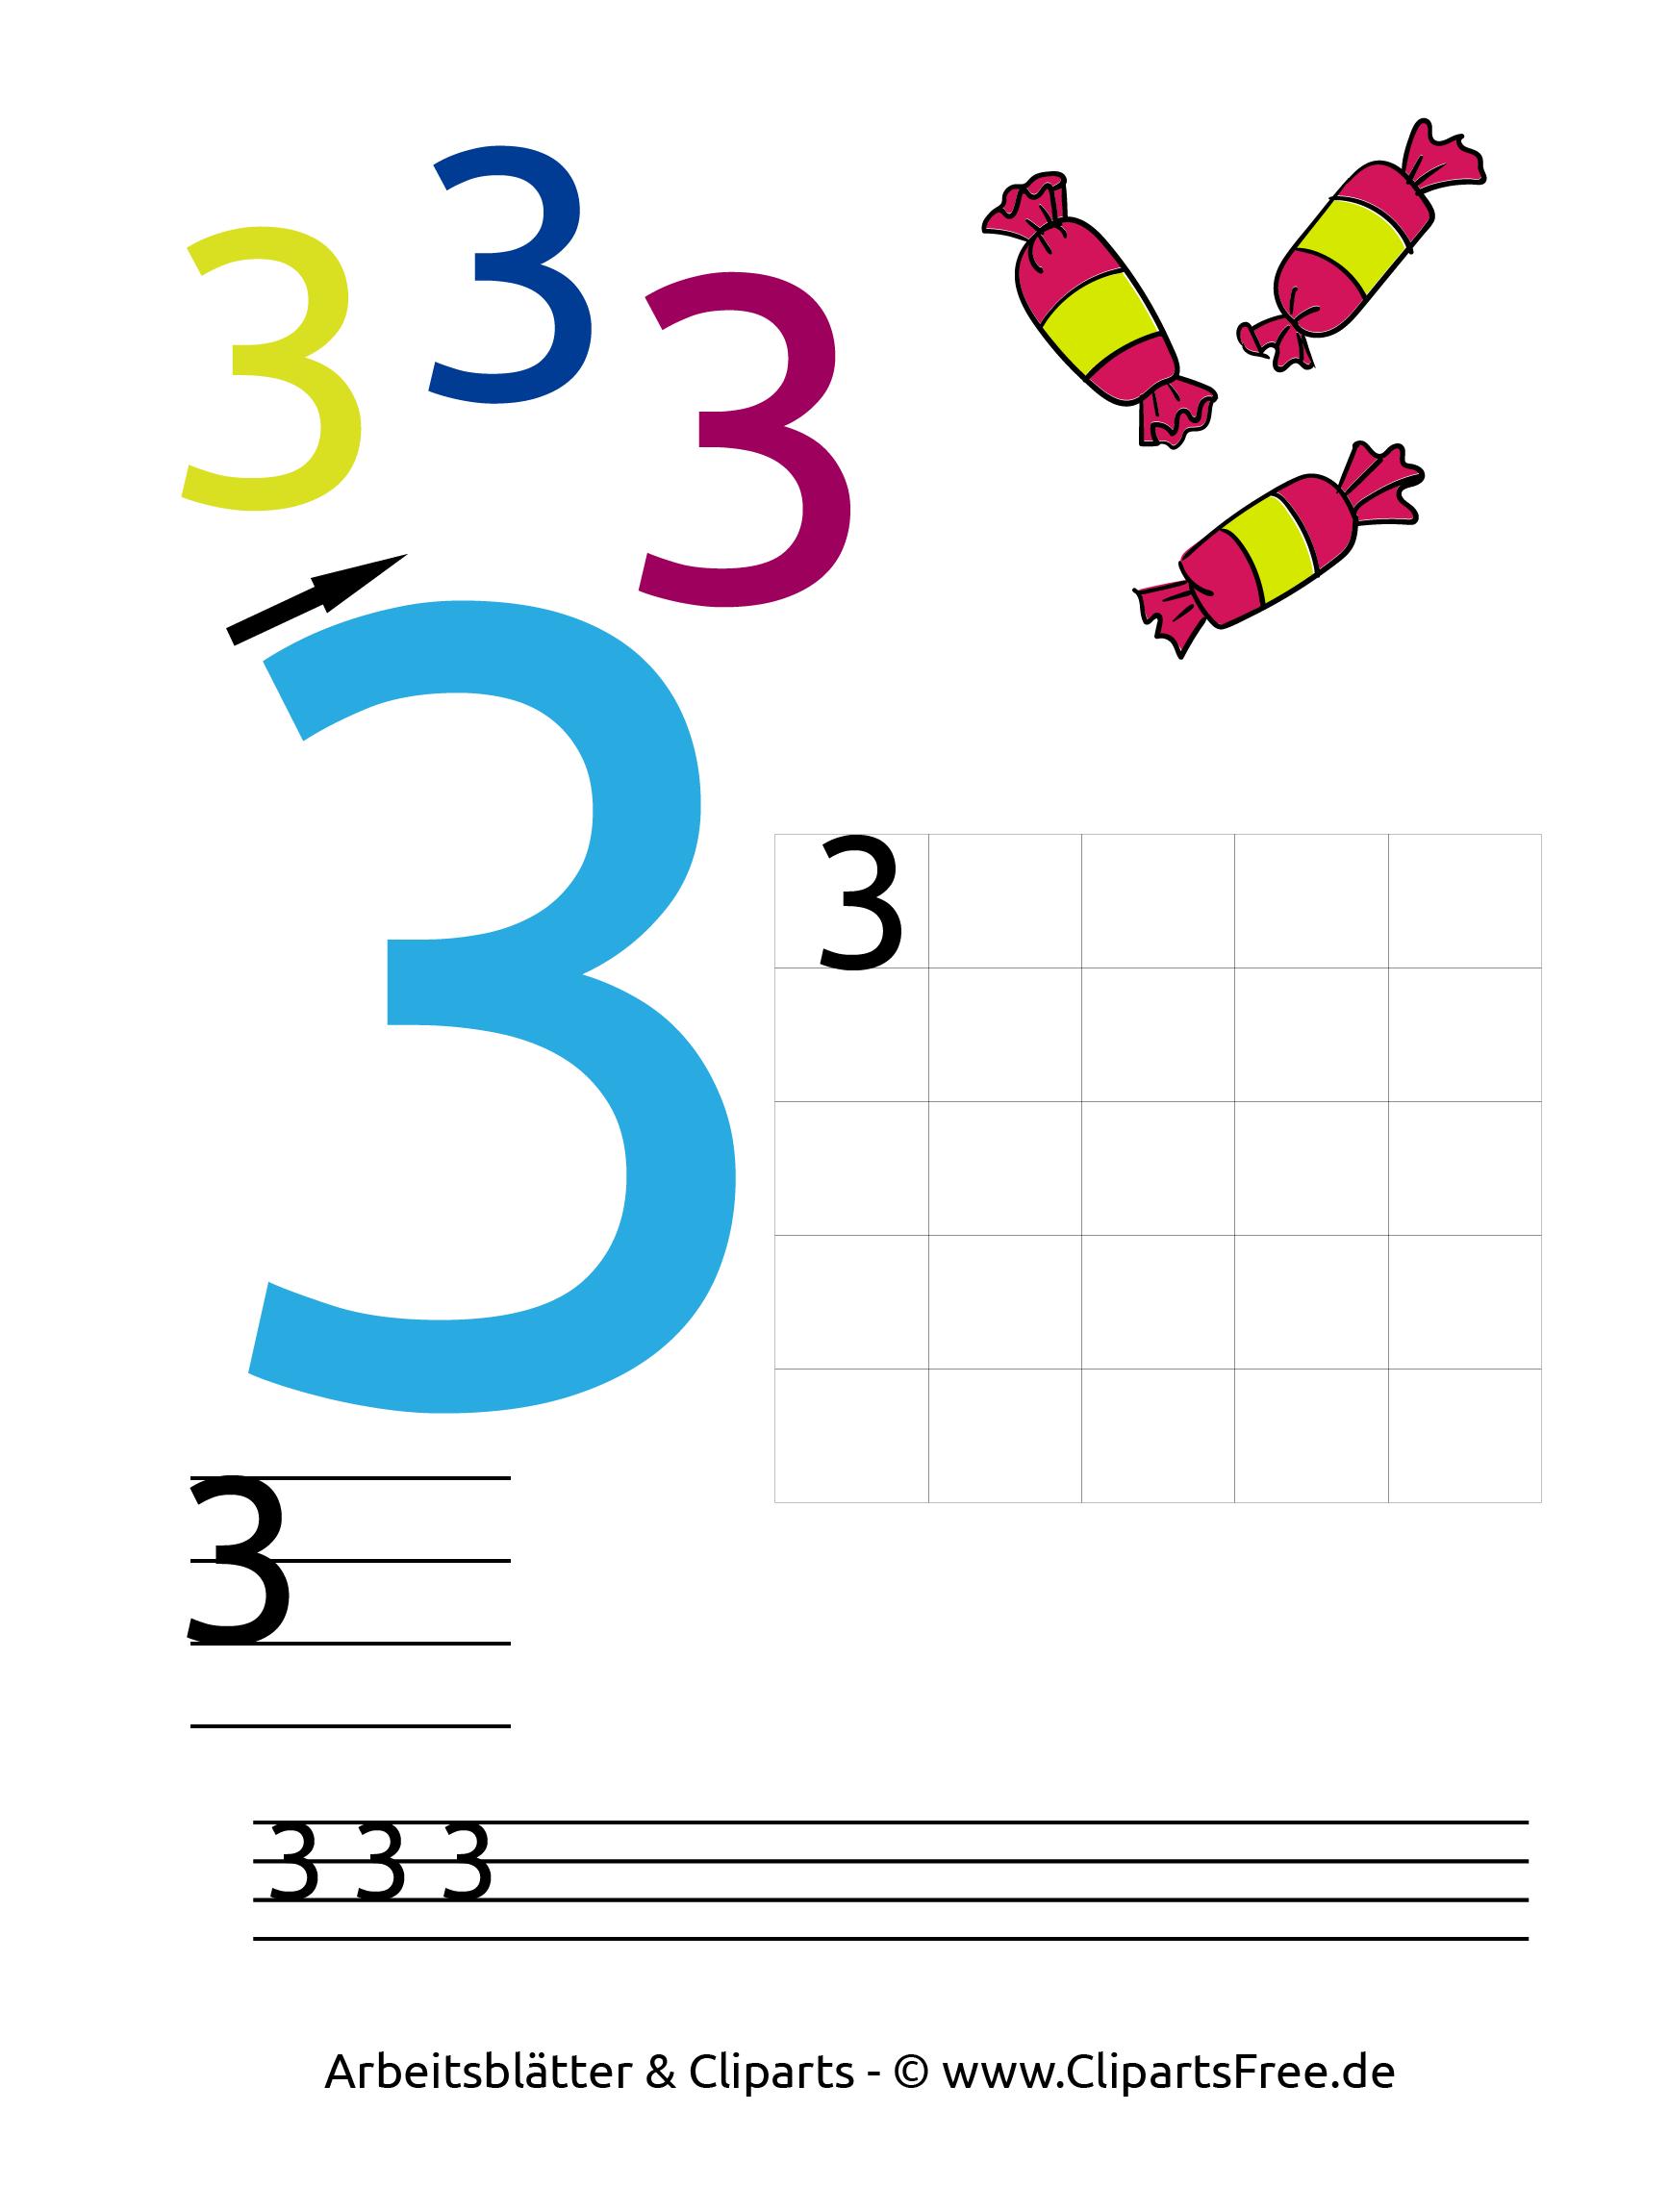 3 - Mathe Arbeitsblätter Zahlen lernen 1. Klasse